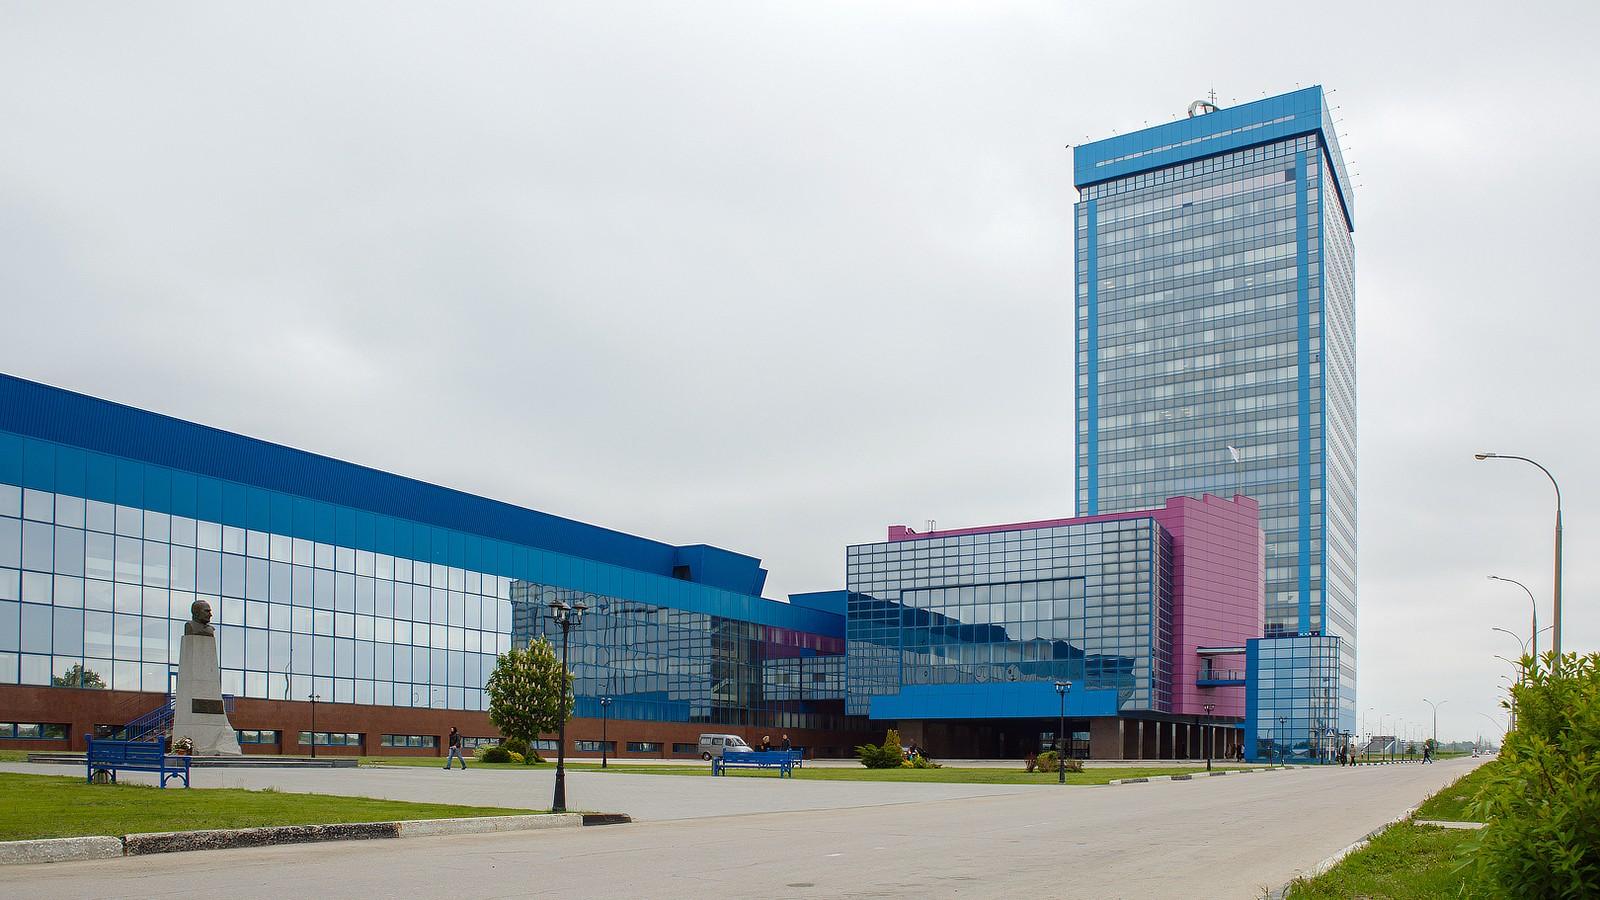 На фото: здание заводоуправления АВТОВАЗа